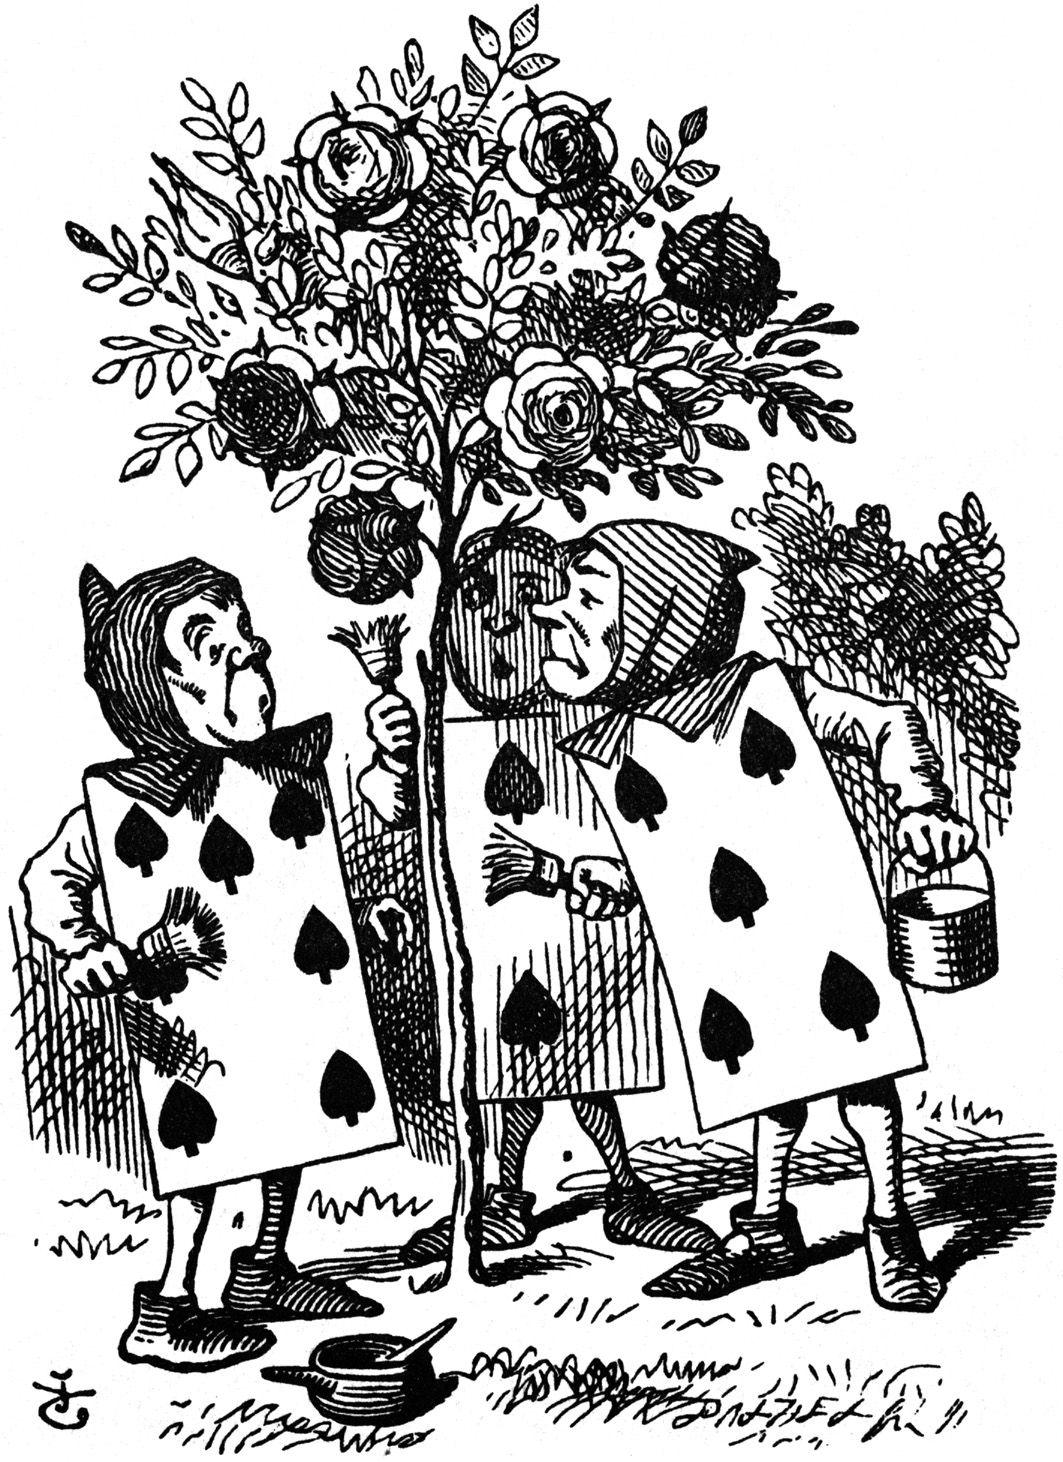 Alice in Wonderland Art Illustrations | Original illustration by ...